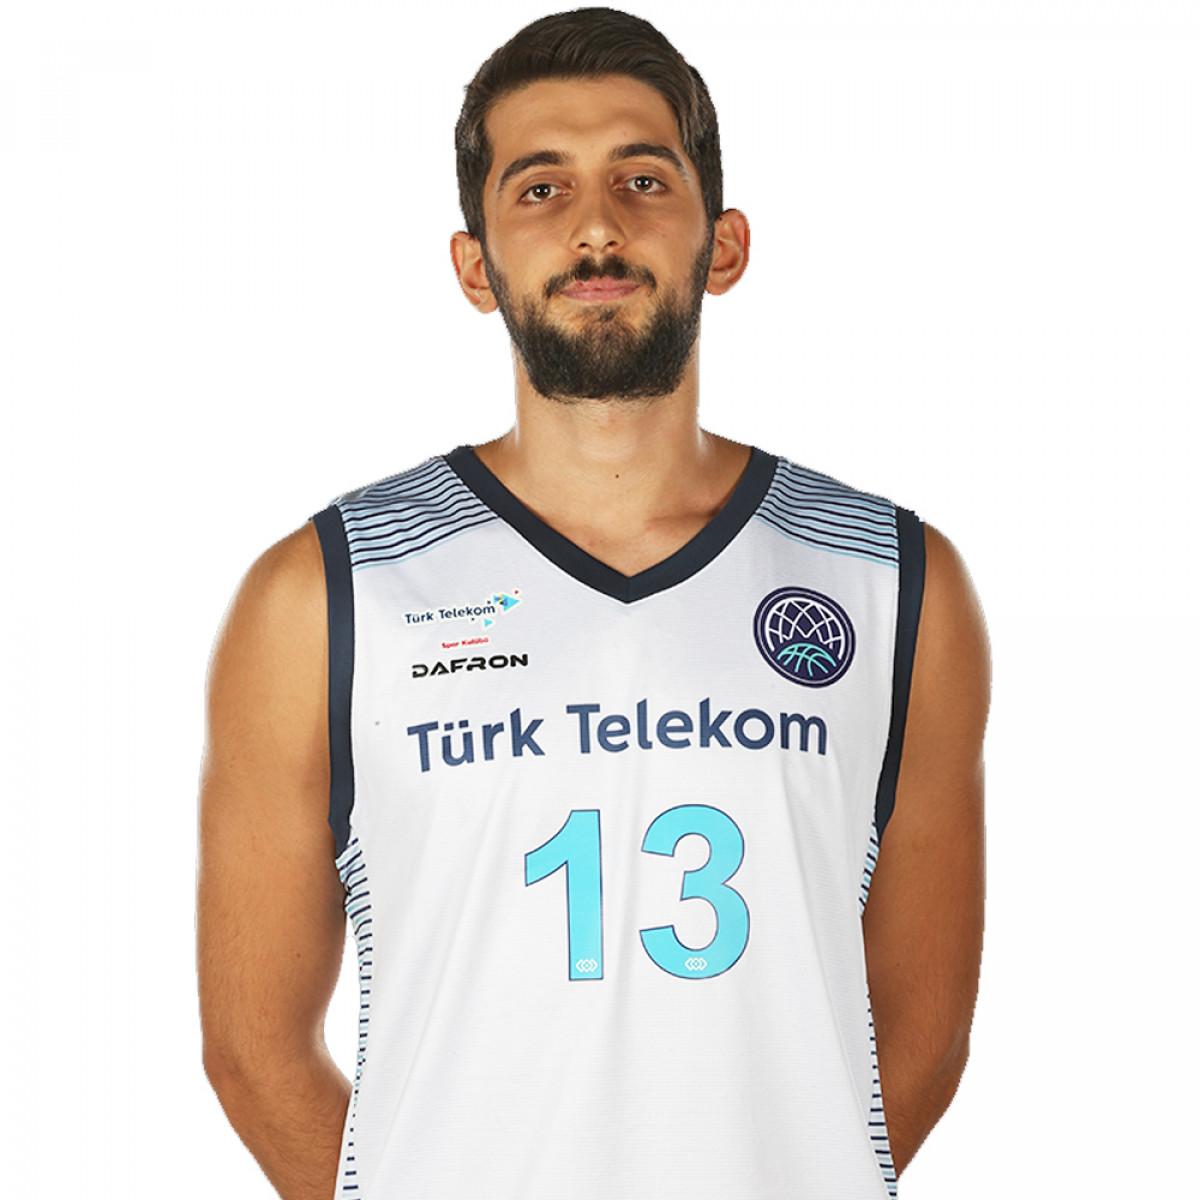 Photo of Ercan Bayrak, 2019-2020 season